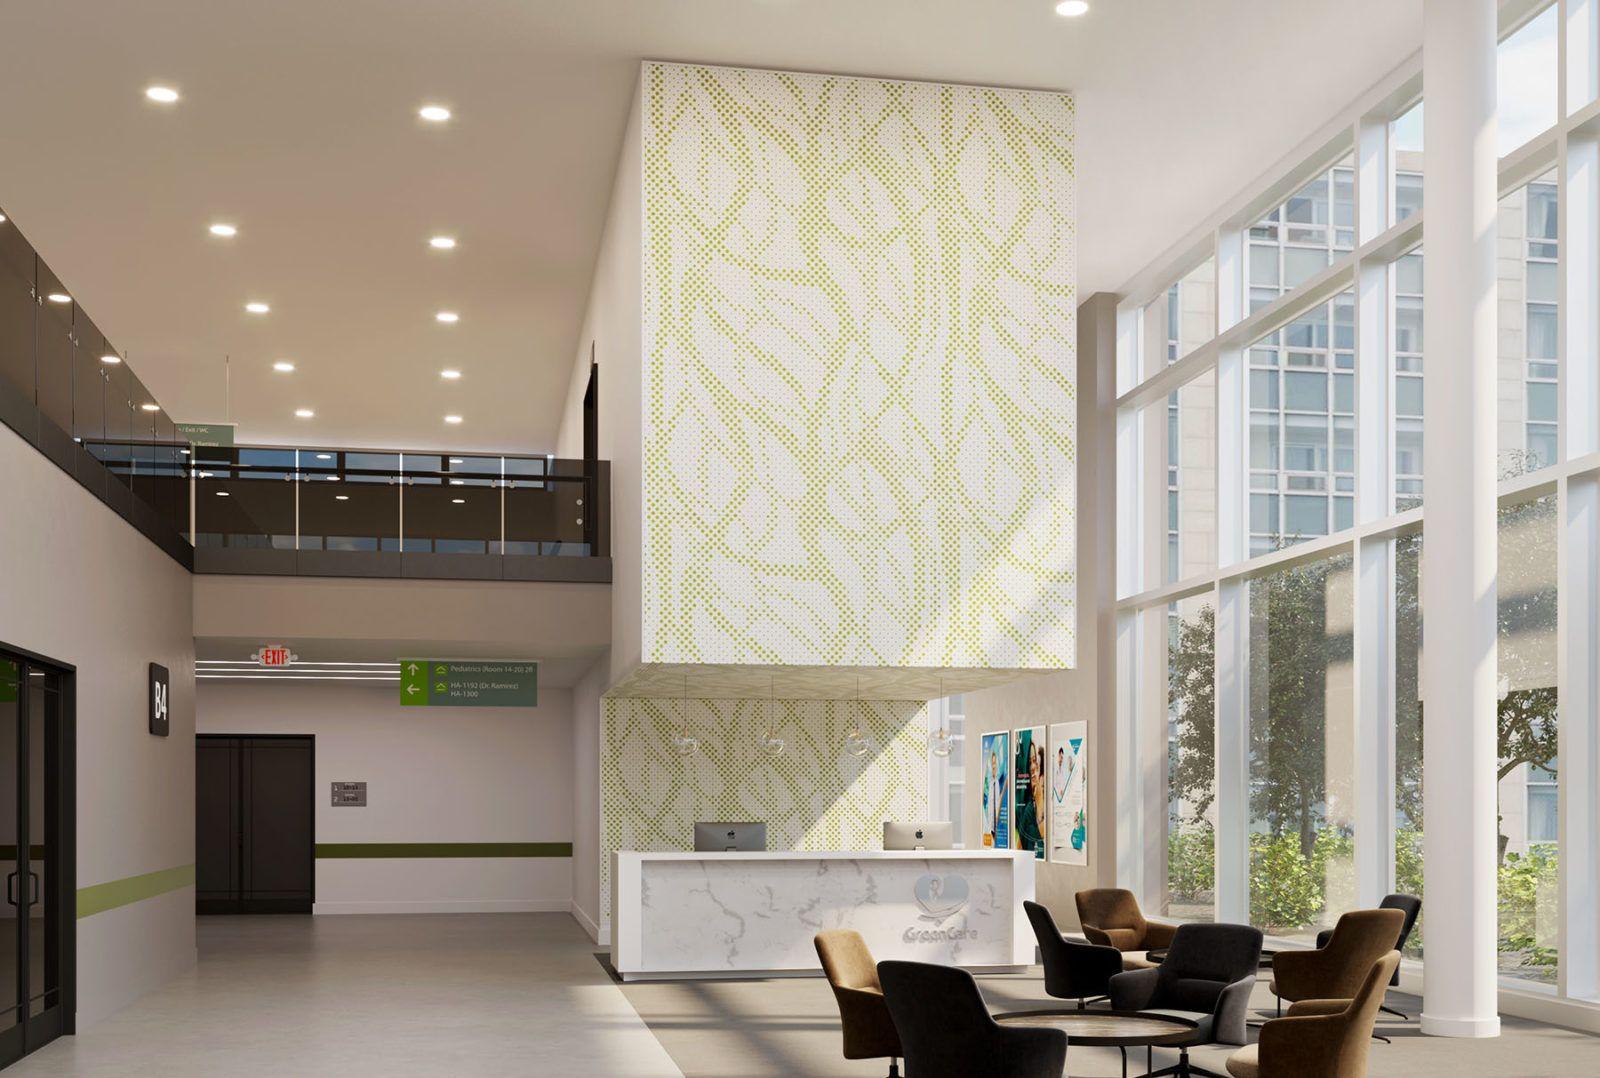 Current Wall Flats 3d Wall Panels Wall Panel Design Modern Wall Tiles Wall Paneling